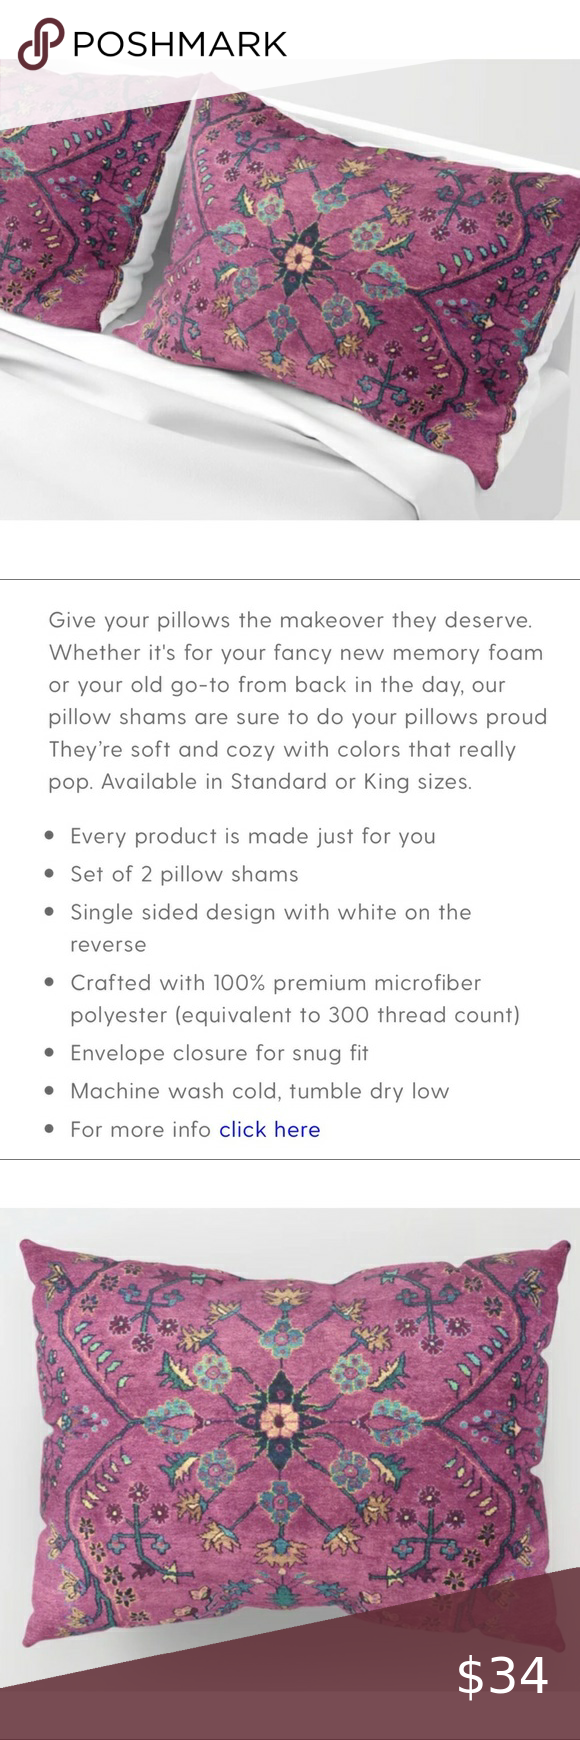 NWOT | Boho pillow shams Adorable boho Persian carpet inspired pillow shams purc...